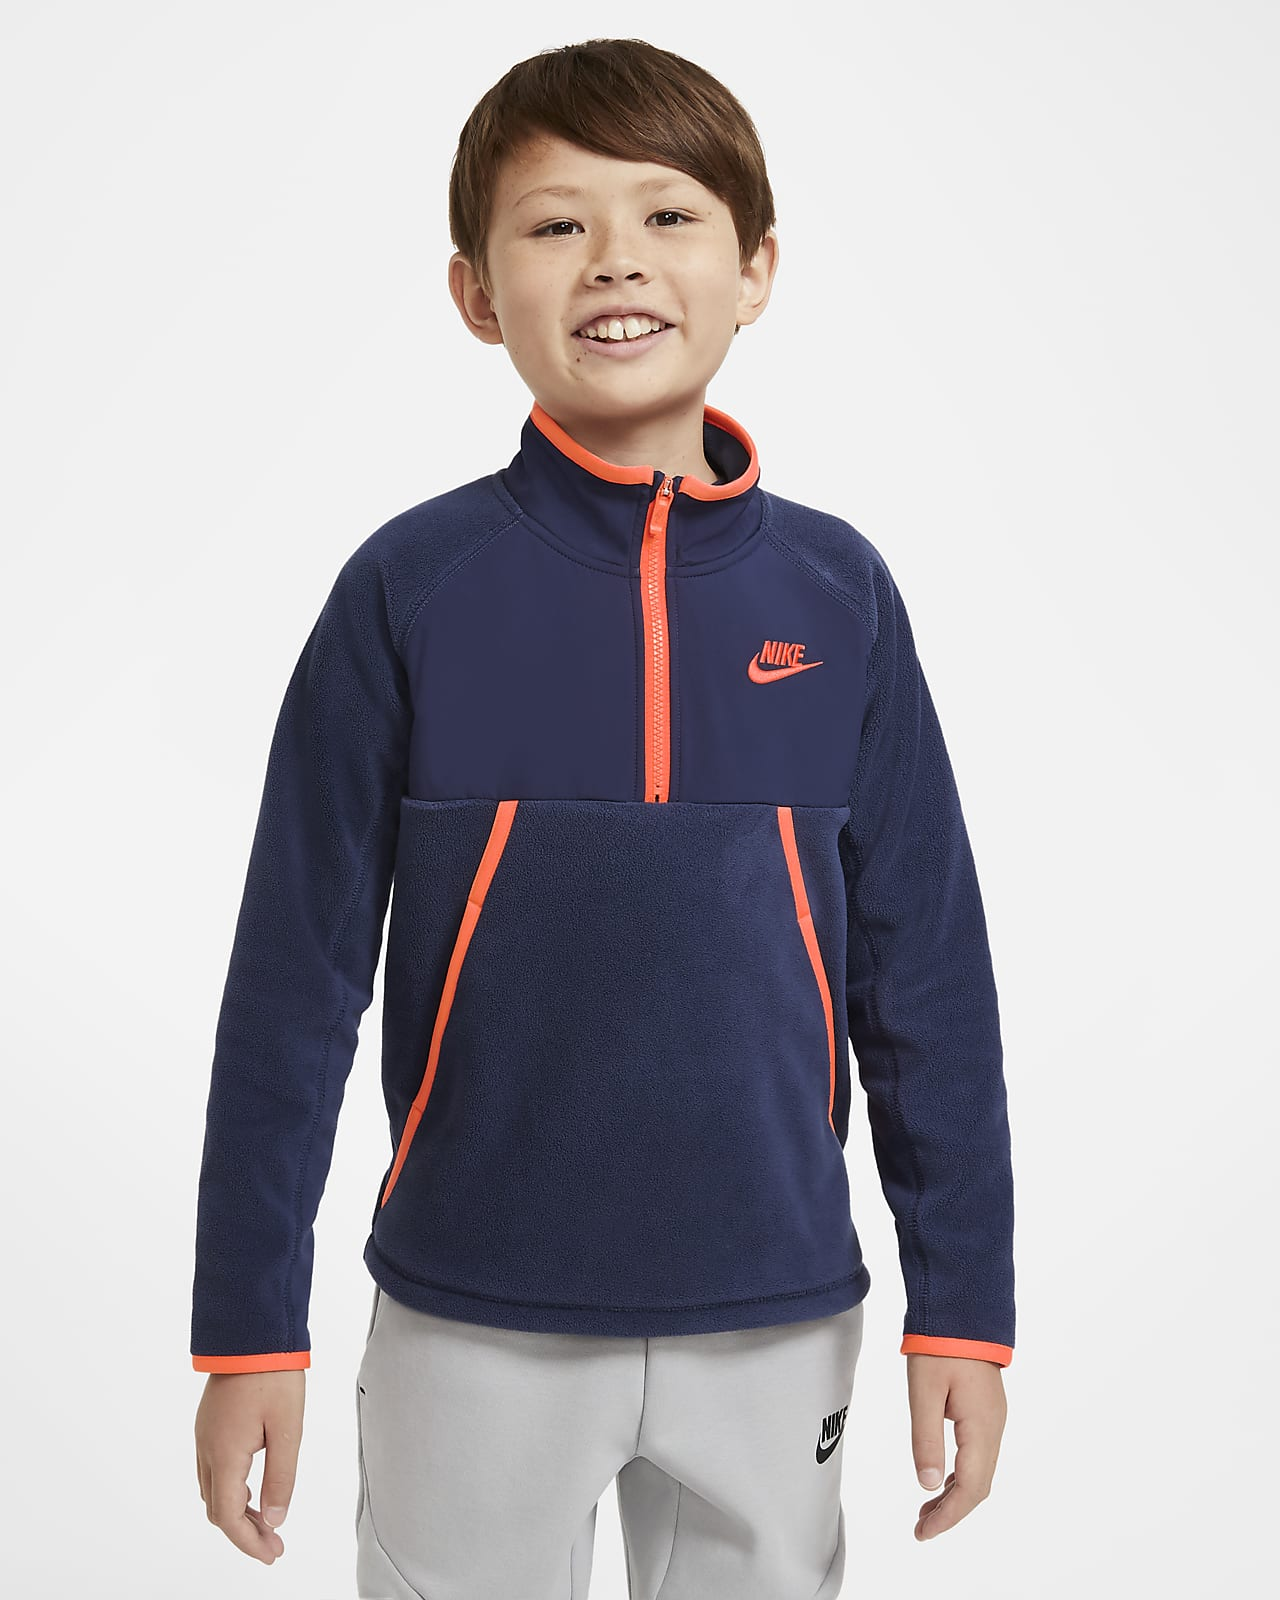 Зимняя худи с молнией на половину длины для мальчиков школьного возраста Nike Sportswear